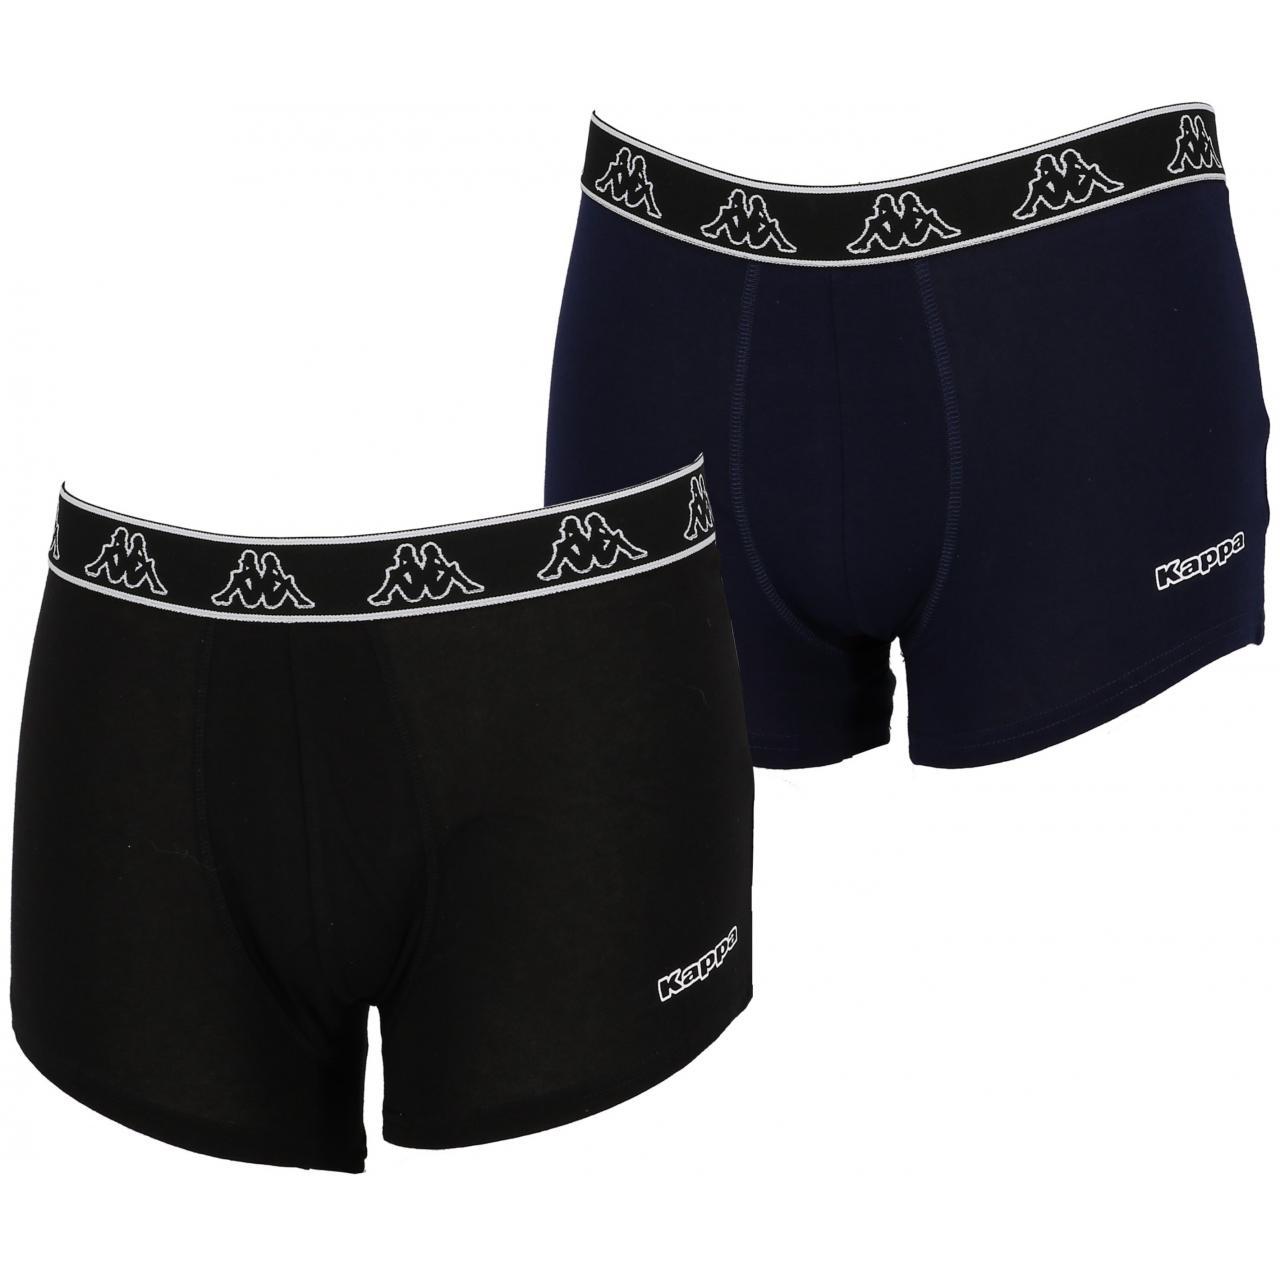 Underwear-Boxer-Kappa-Ath-Nv-Nr-Boxer-Blue-93558-New